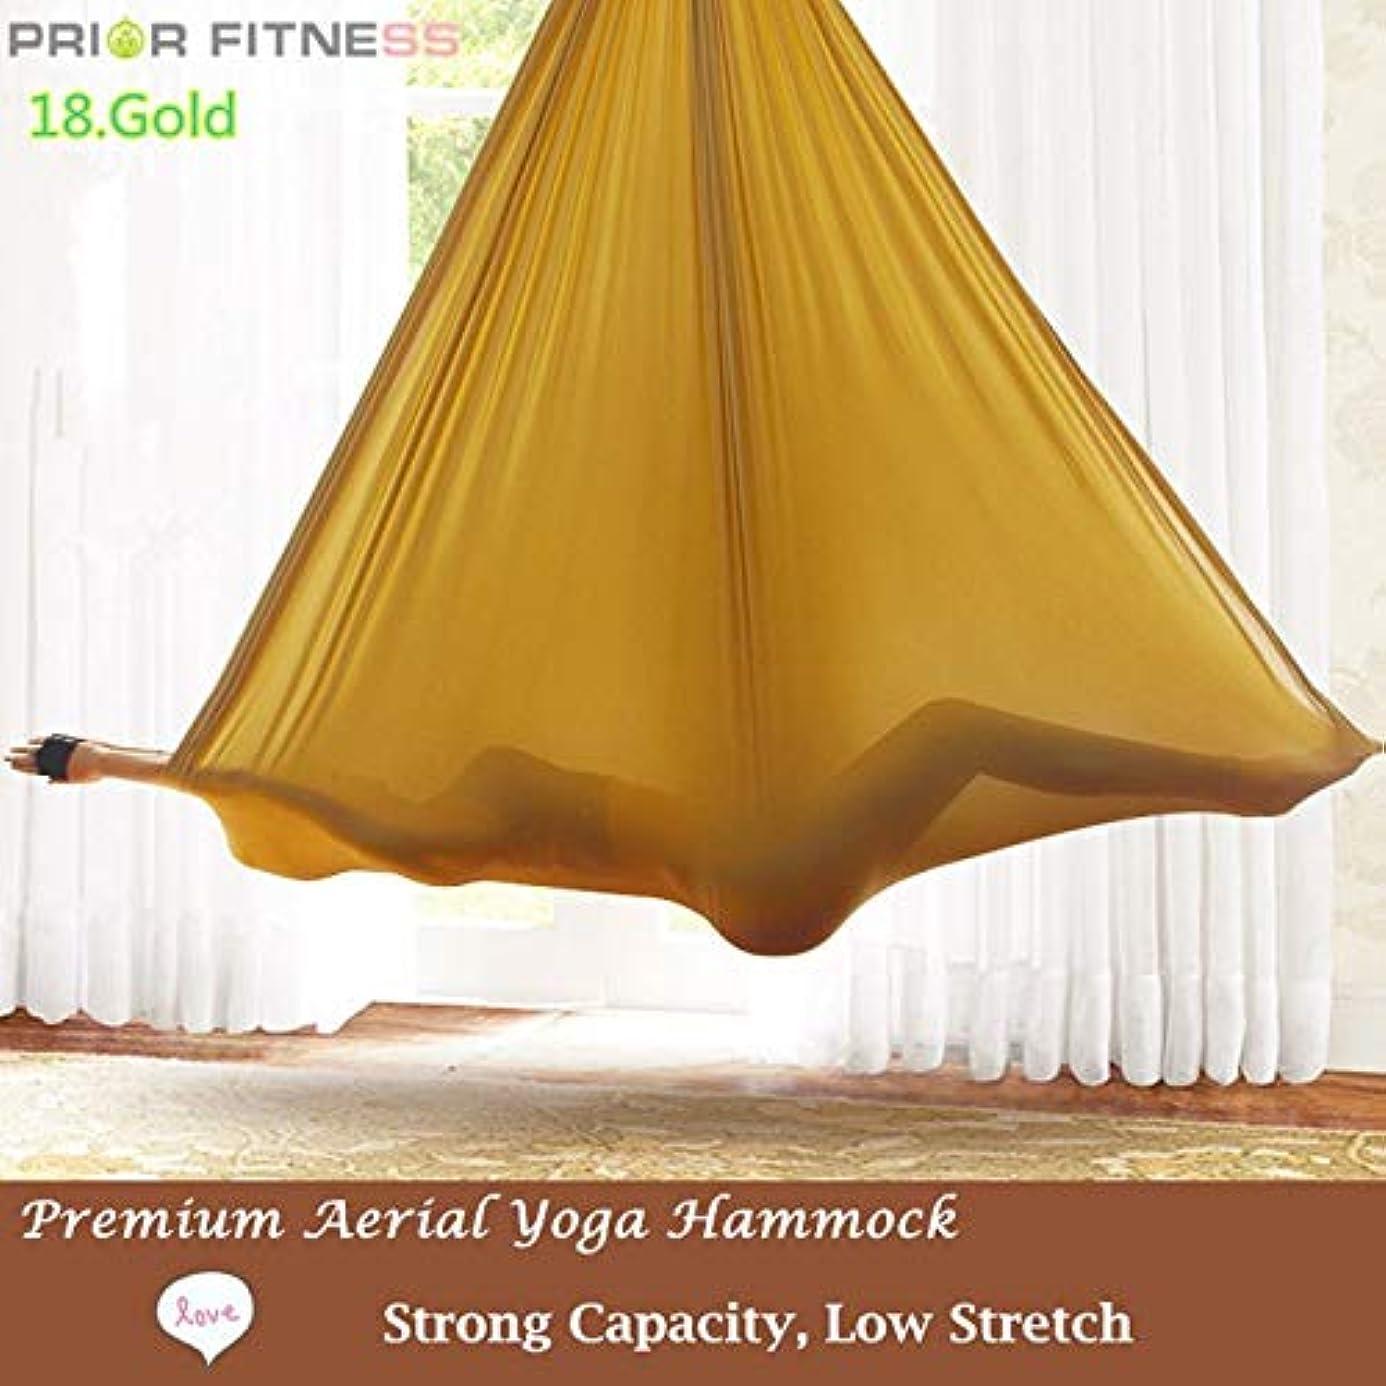 HogiHana Yoga Belts - Anti-Gravity Yoga Hammock Set Swing 20 Colors 5m Aerial Flying Bodybuilding Workout Fitness Equipment 100% Quality Guarantee 1 PCs